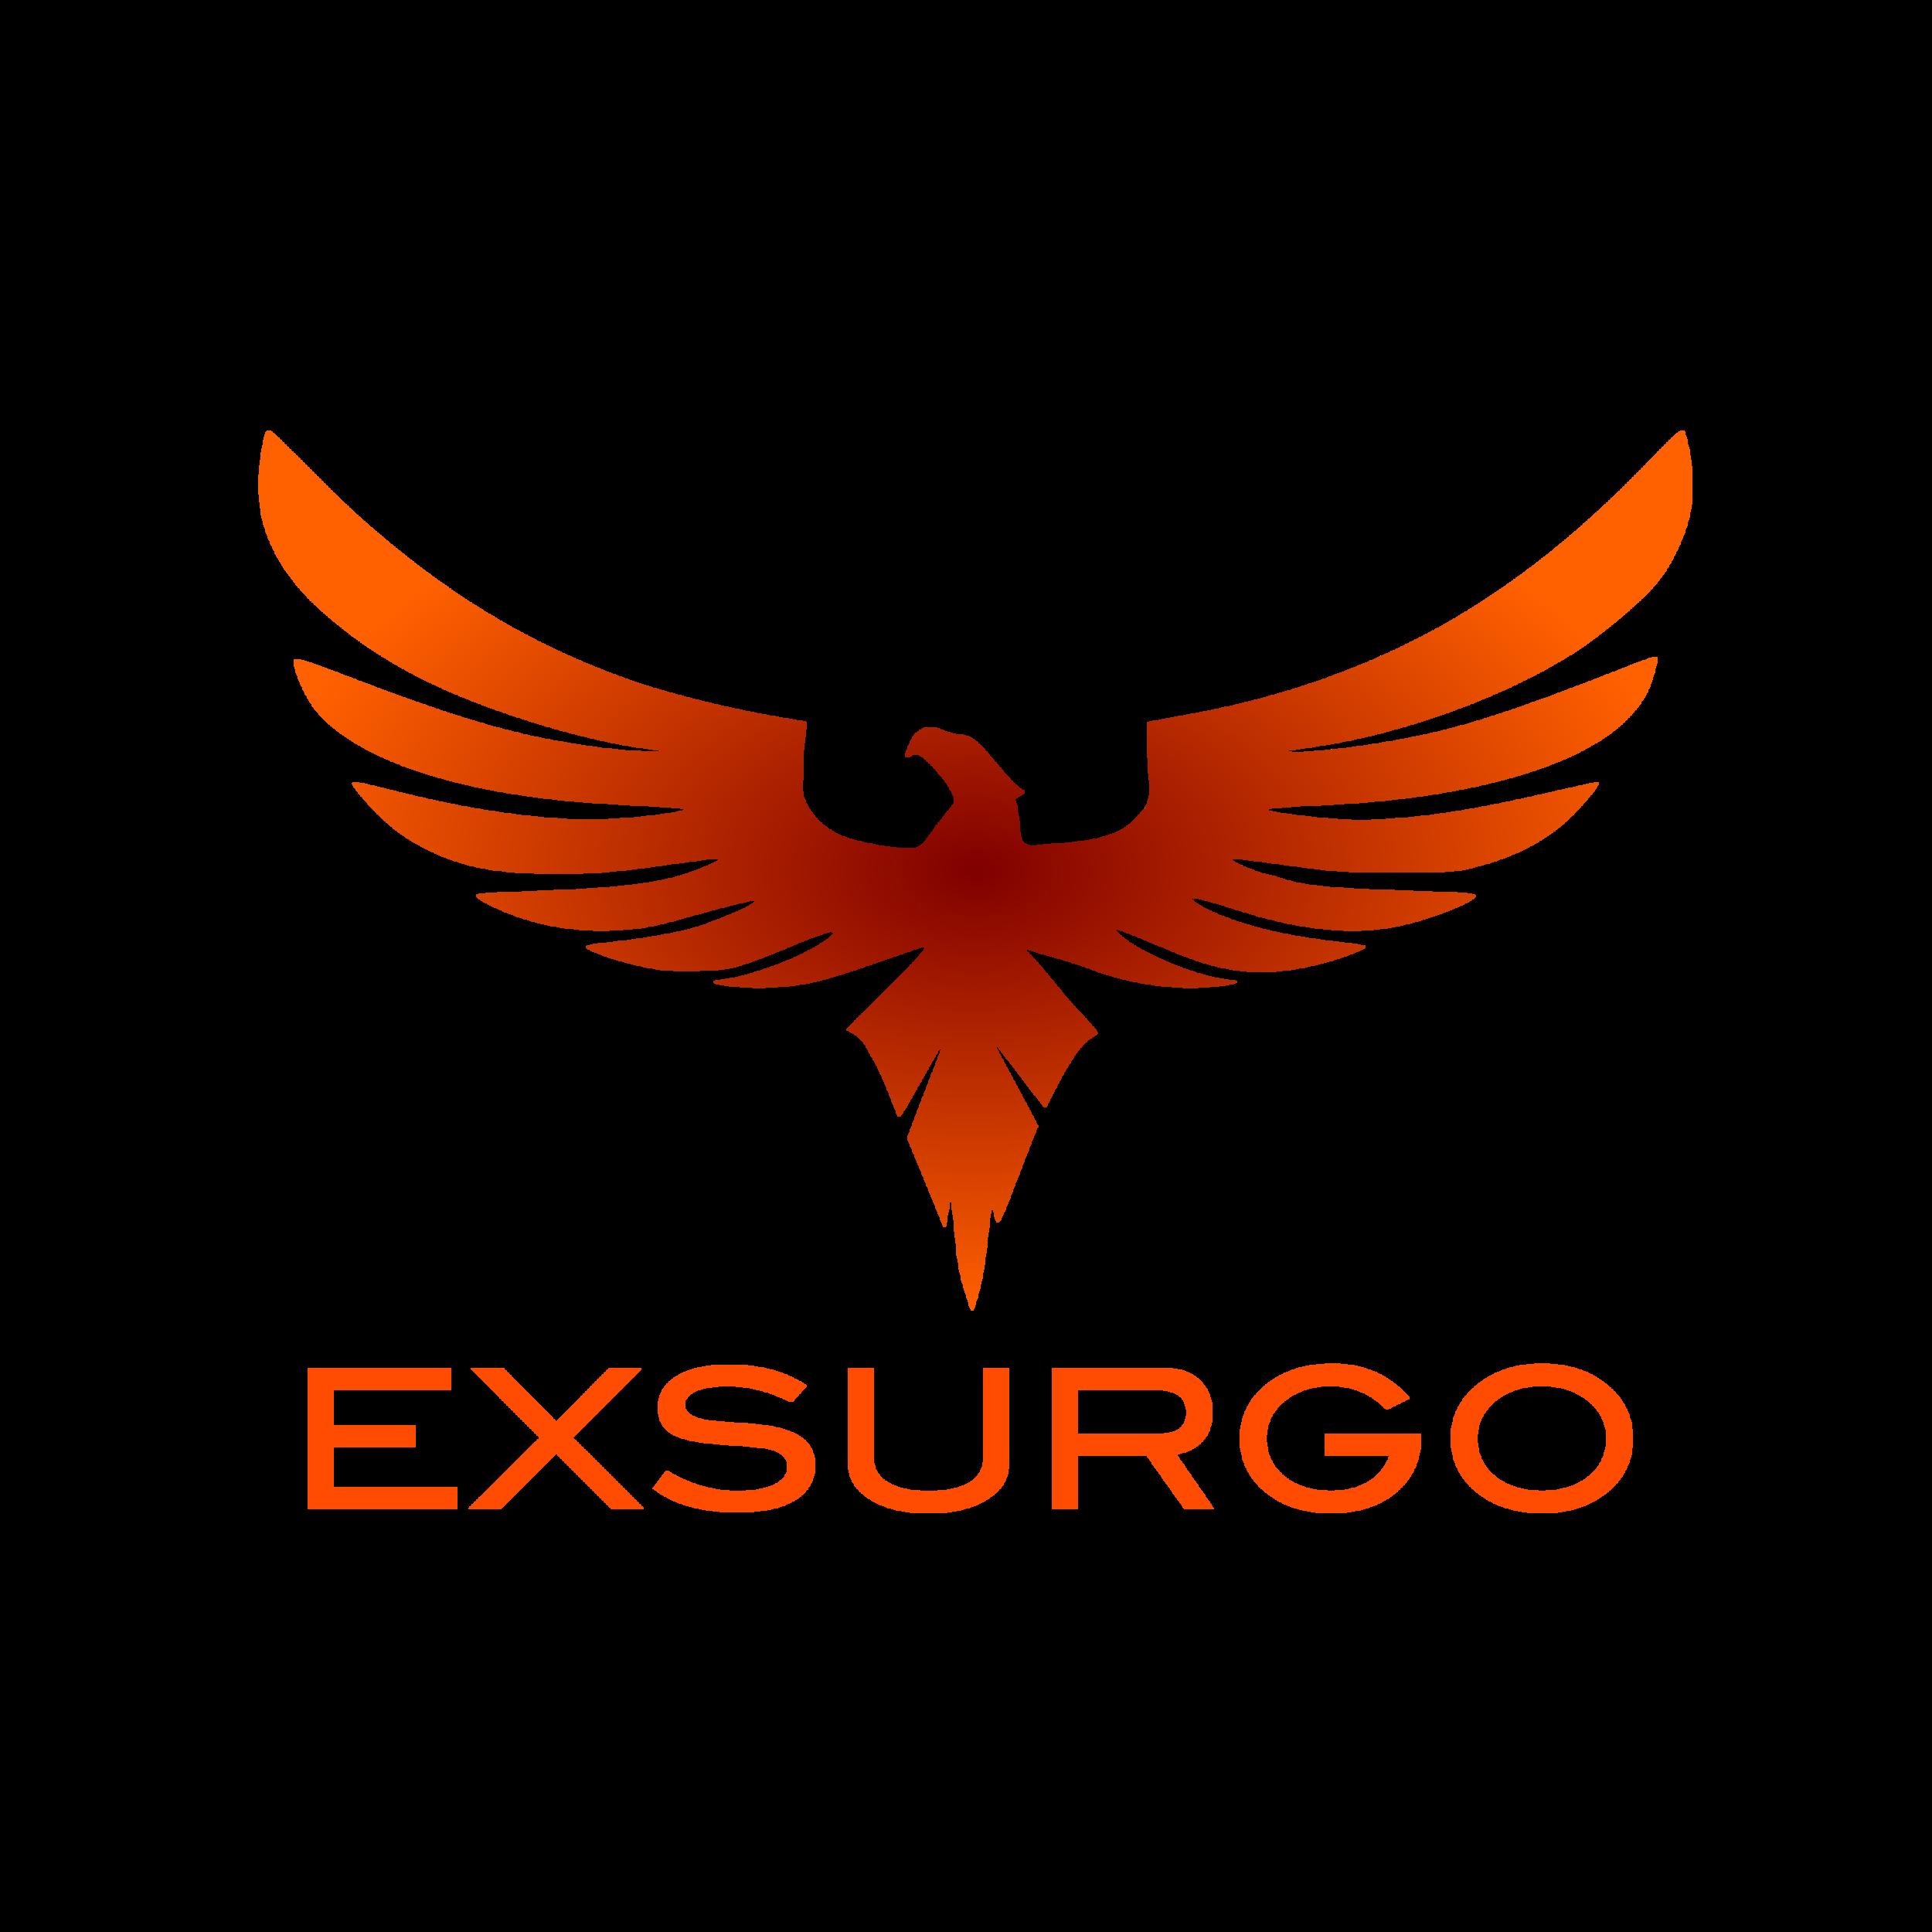 Exsurgo logo.png